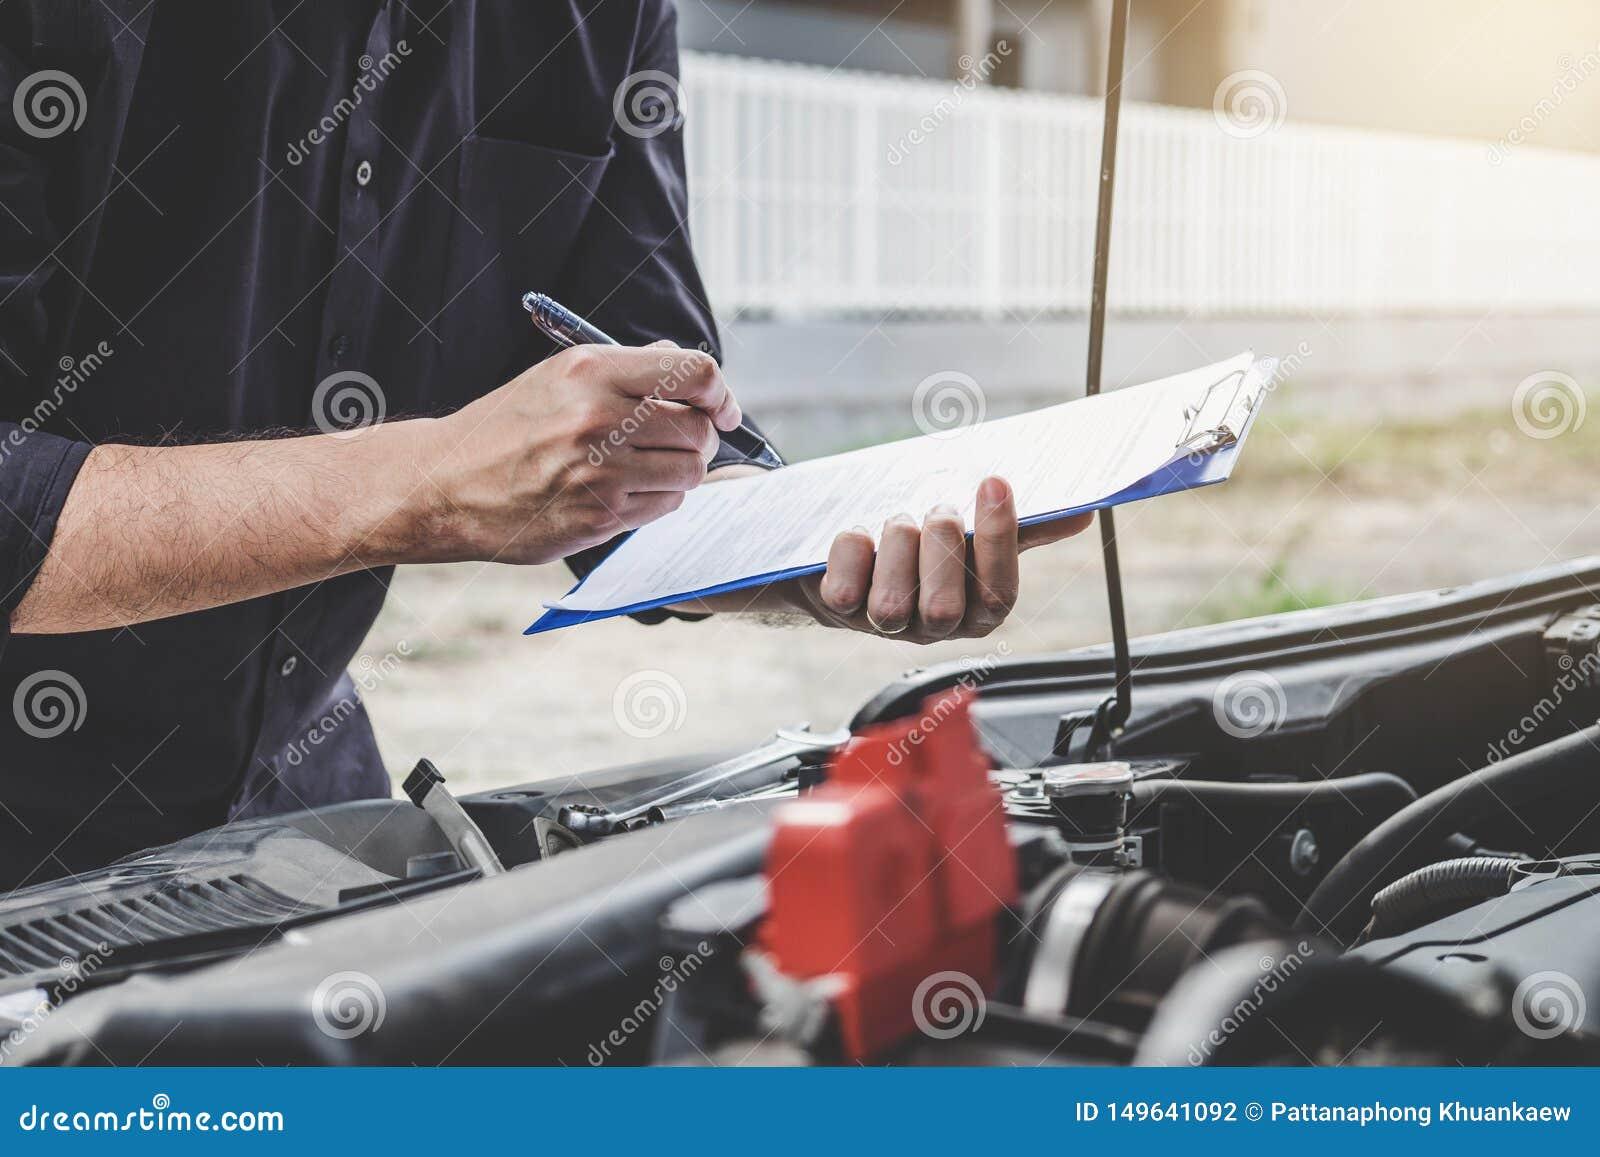 Car service essay